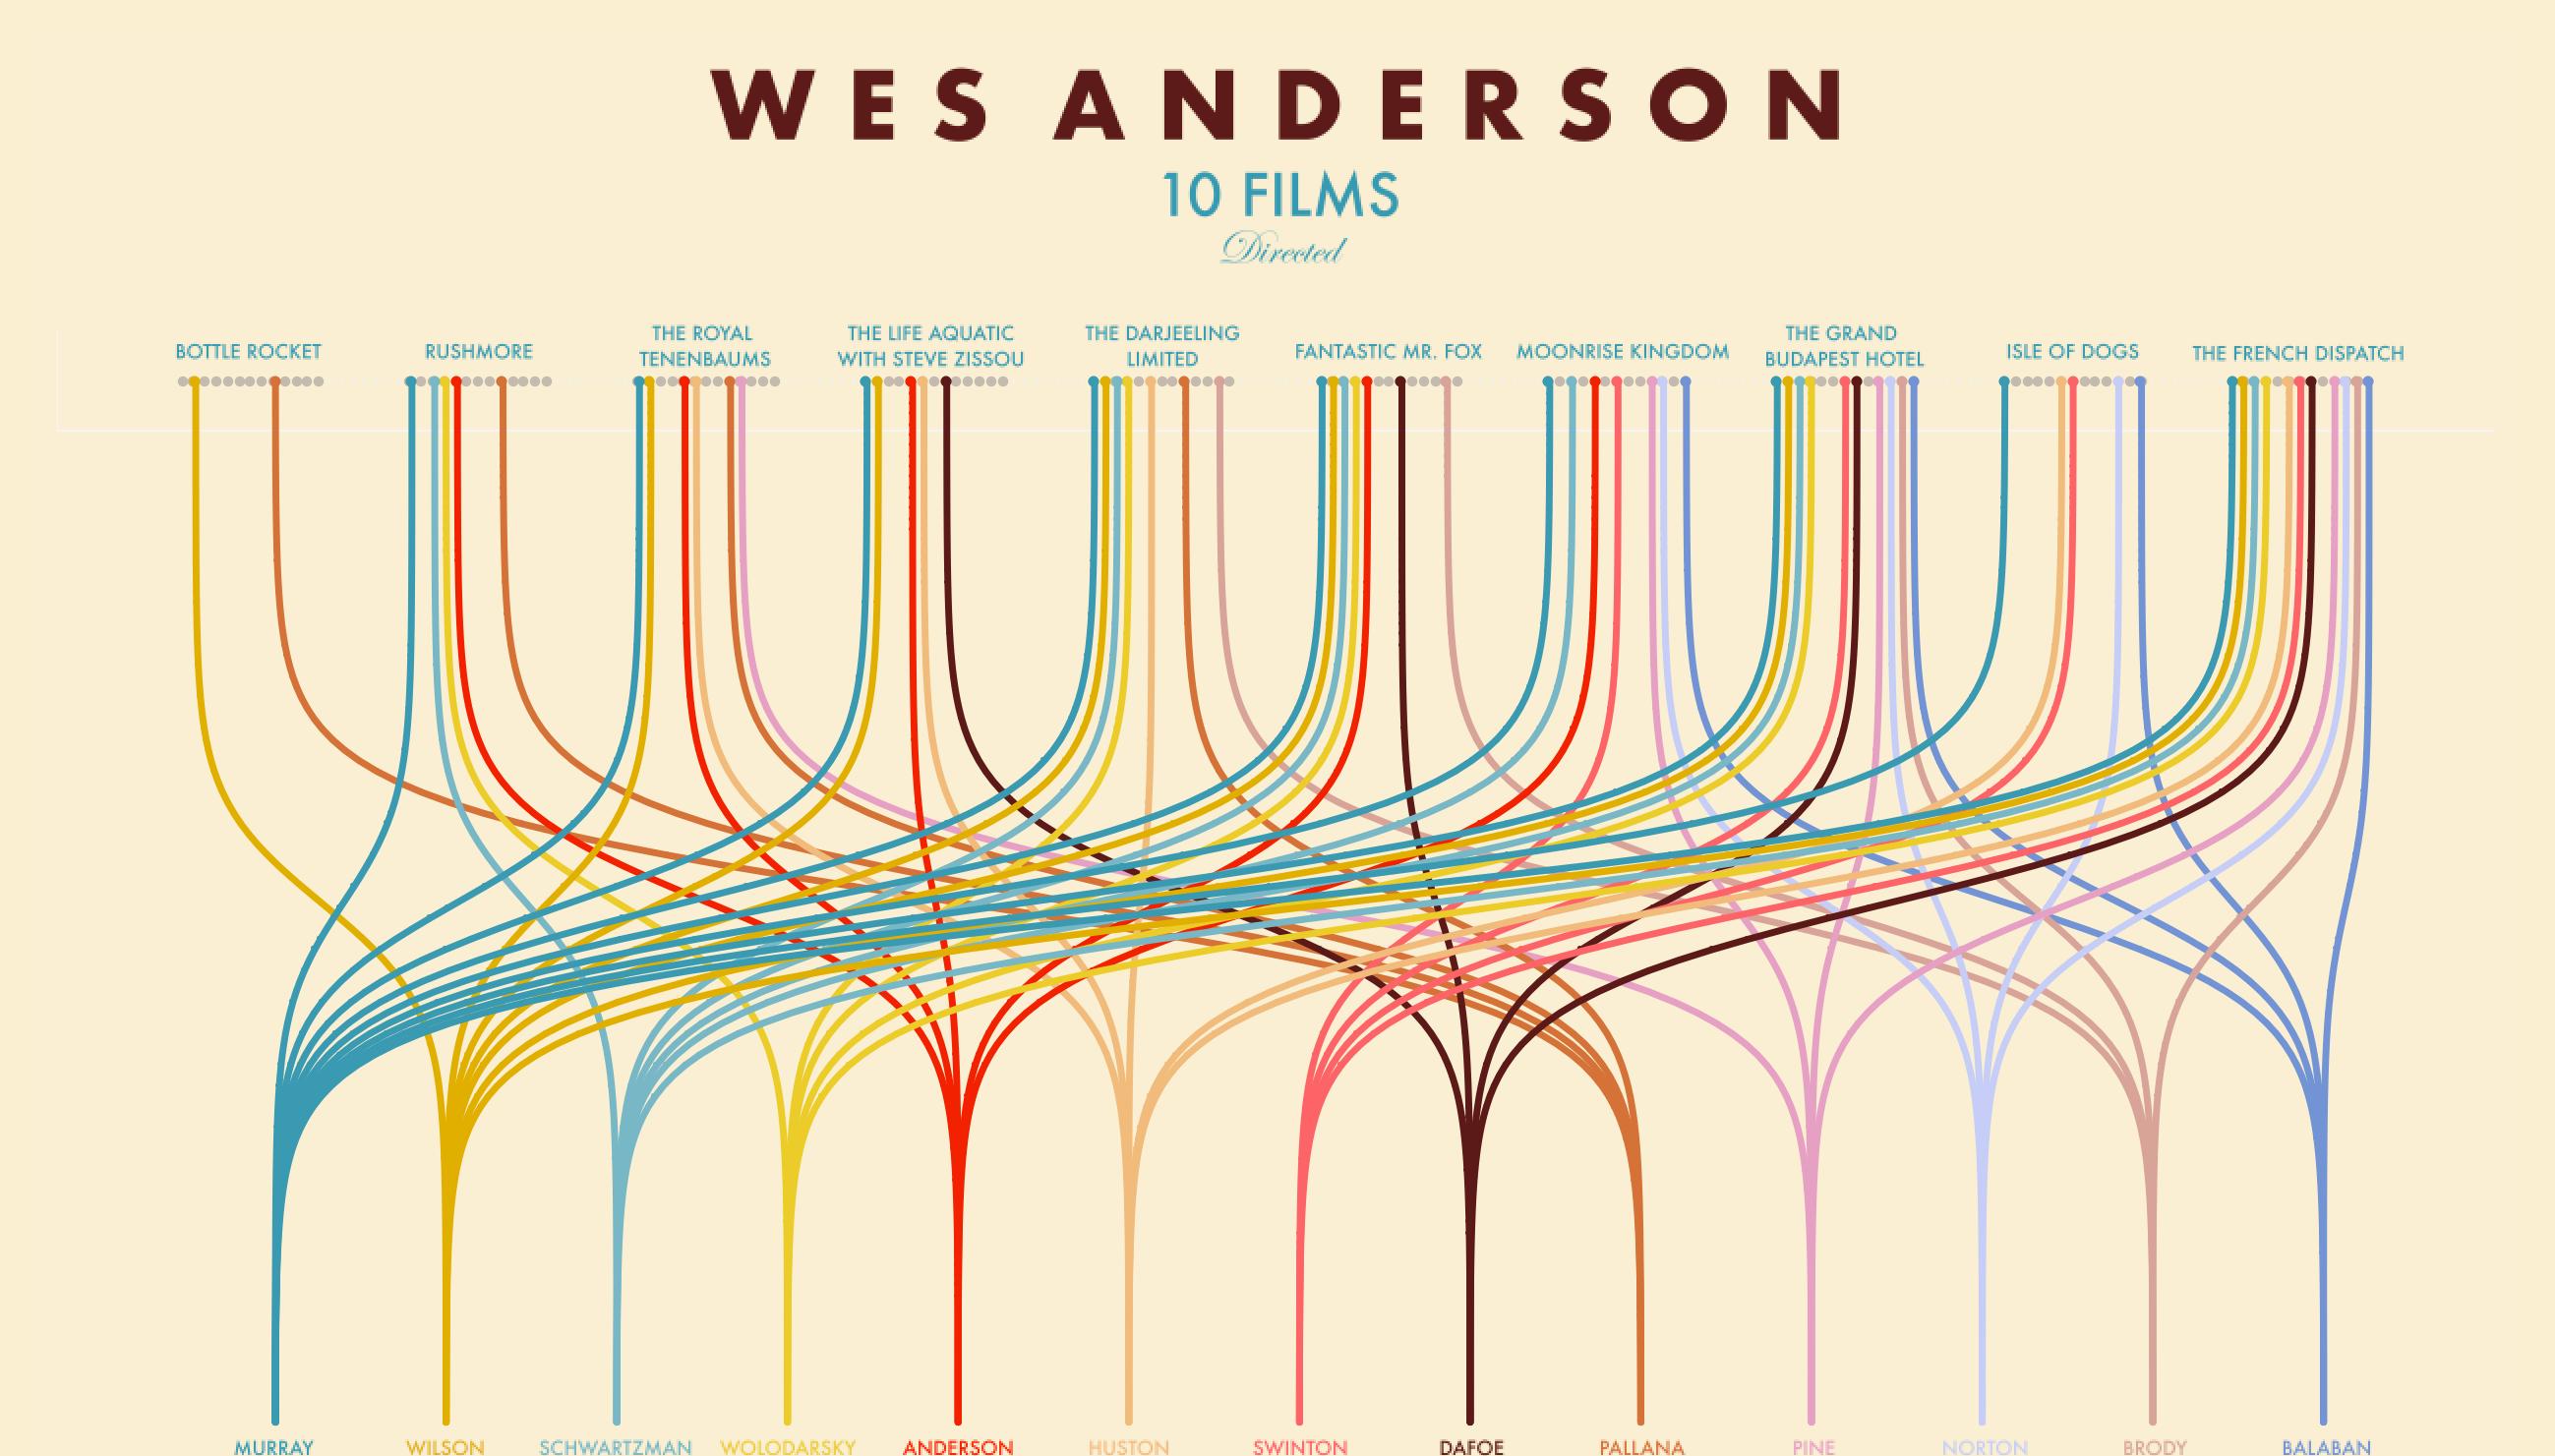 Viz of Wes Anderson Films